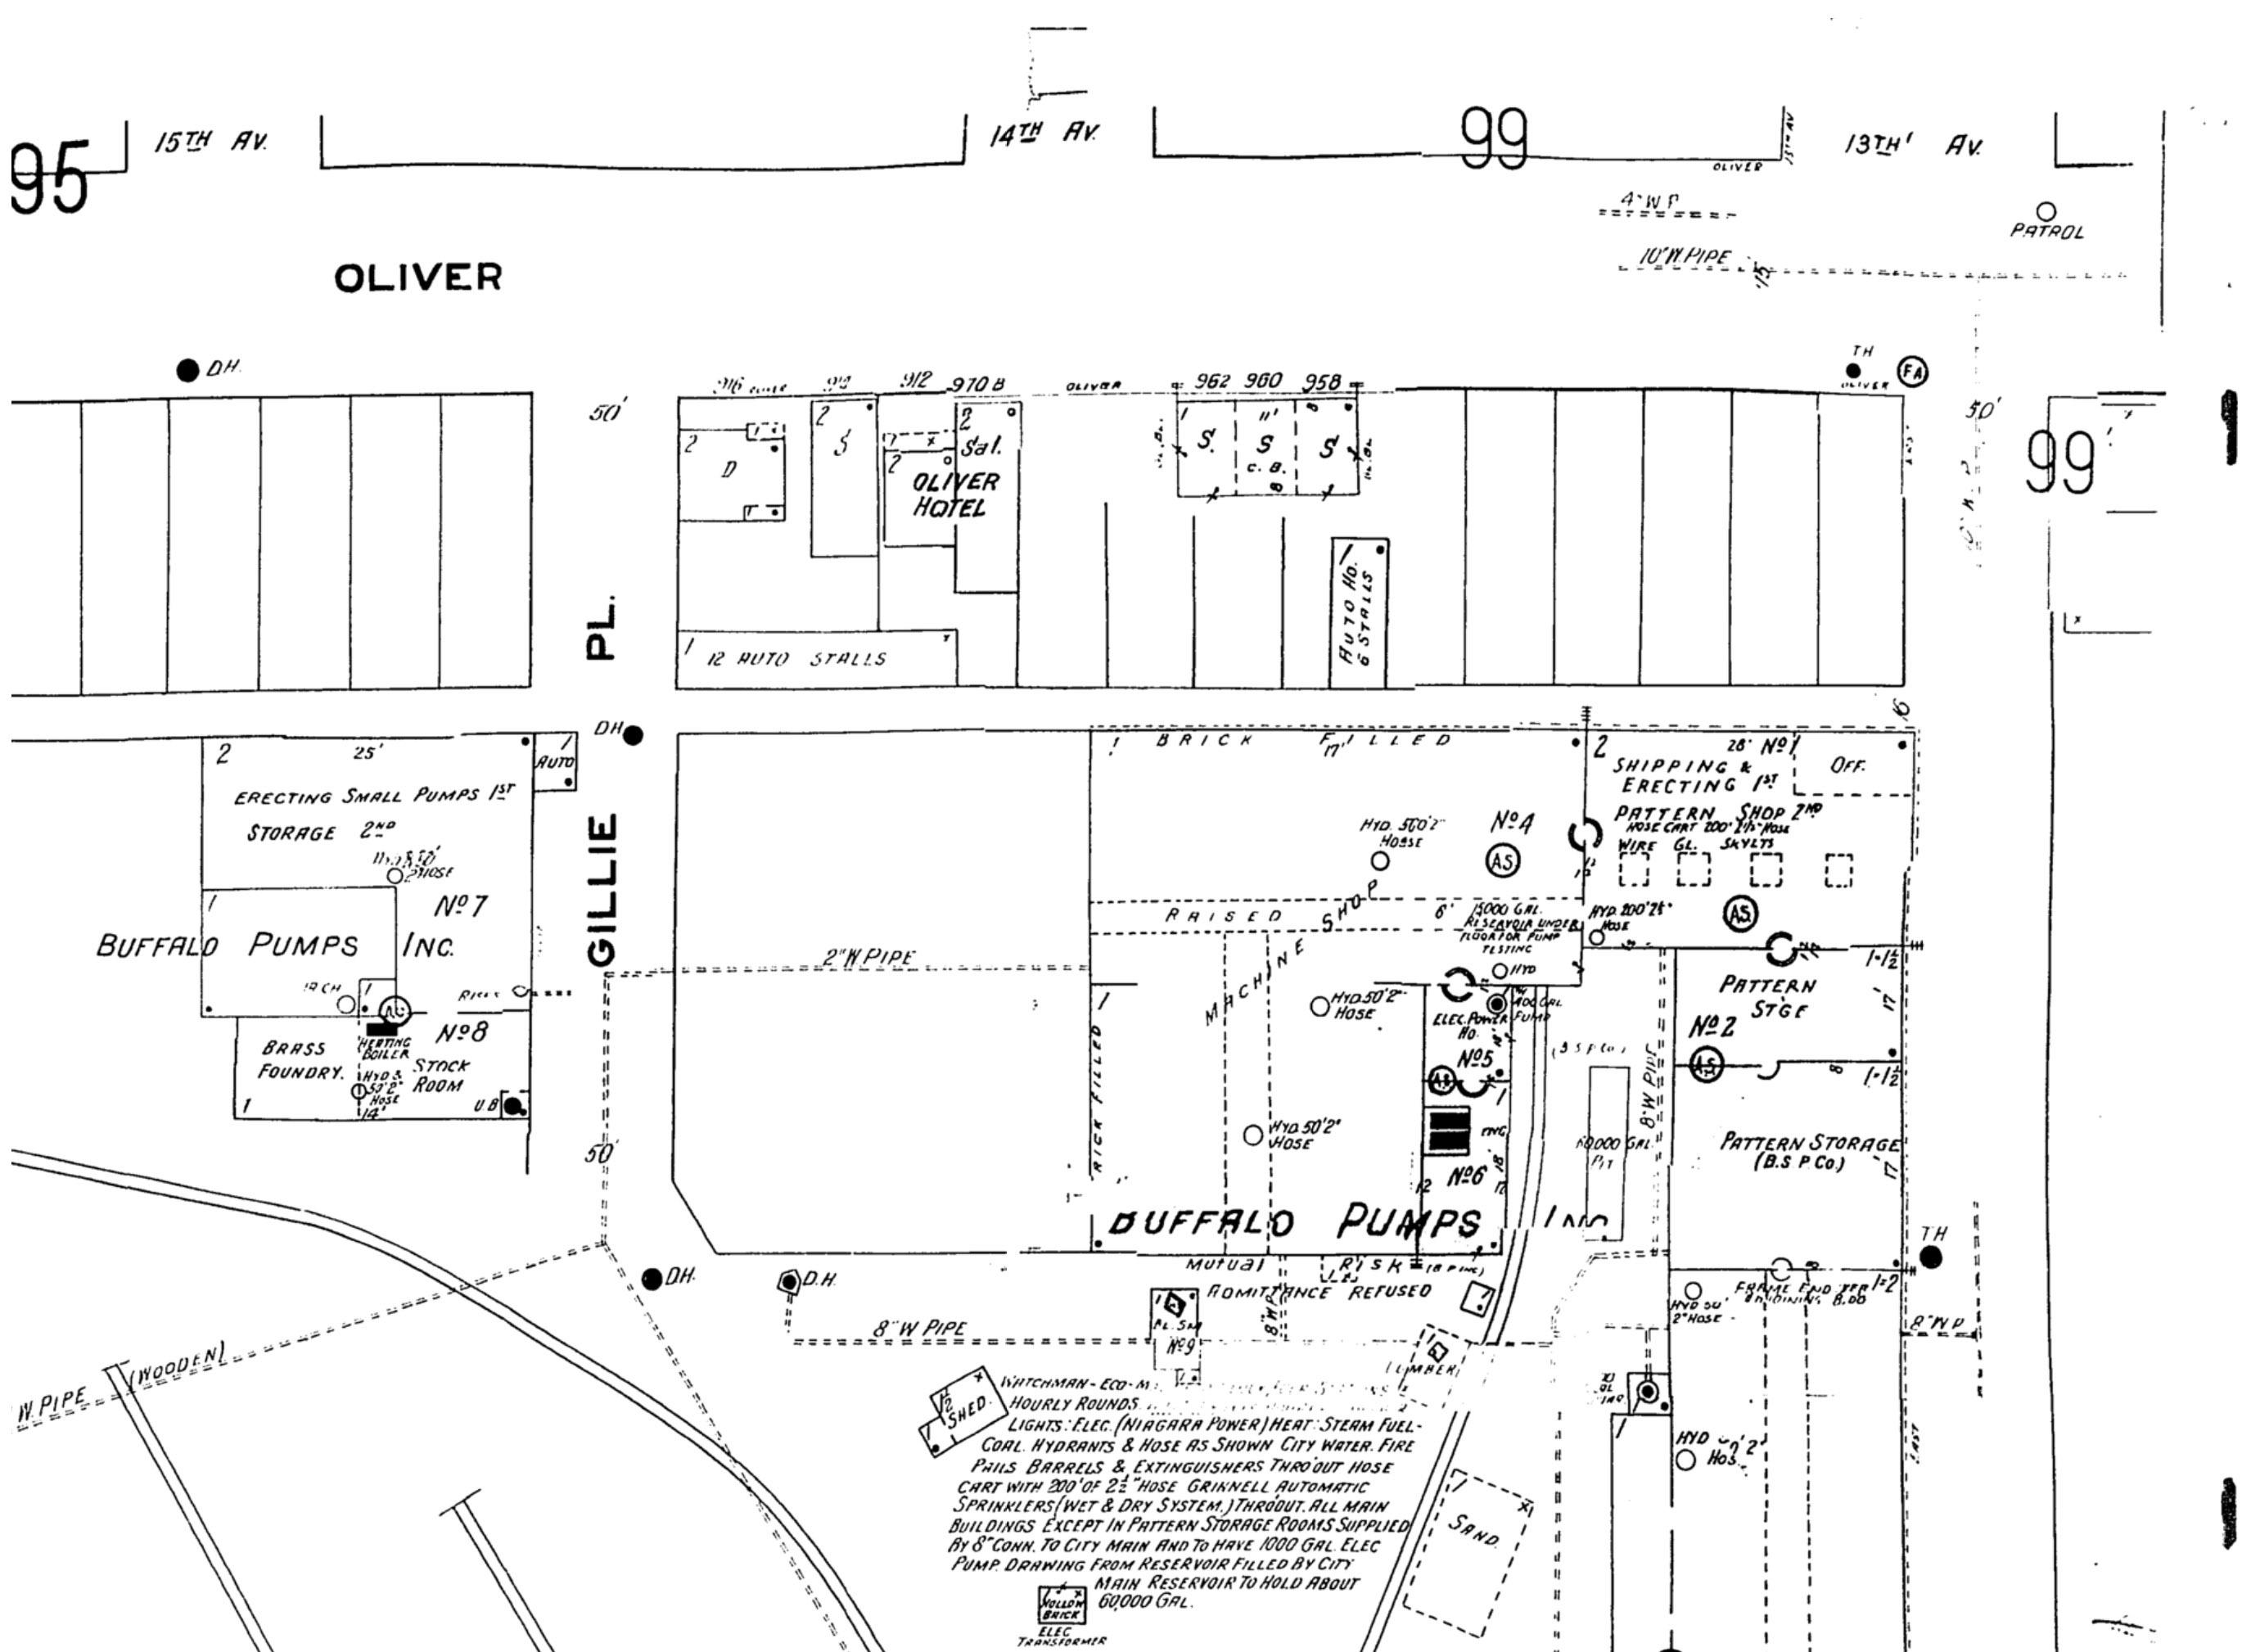 Buffalo Pumps, Gillie Place, map (Sanborn, 1951-01).jpg